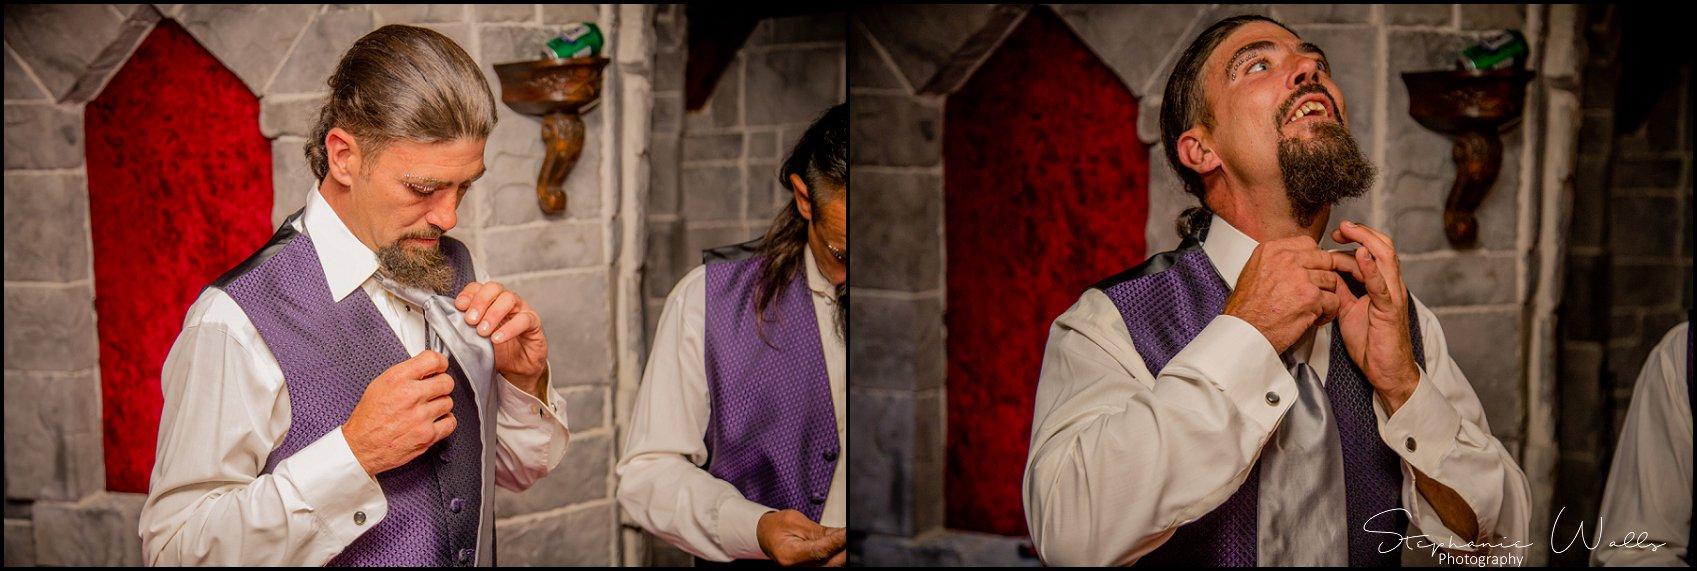 Everist Wedding 017 3 Patti & Bobbys | Troll Haven Castle & Bandy Farms | Sequim, Wa Wedding Photographer